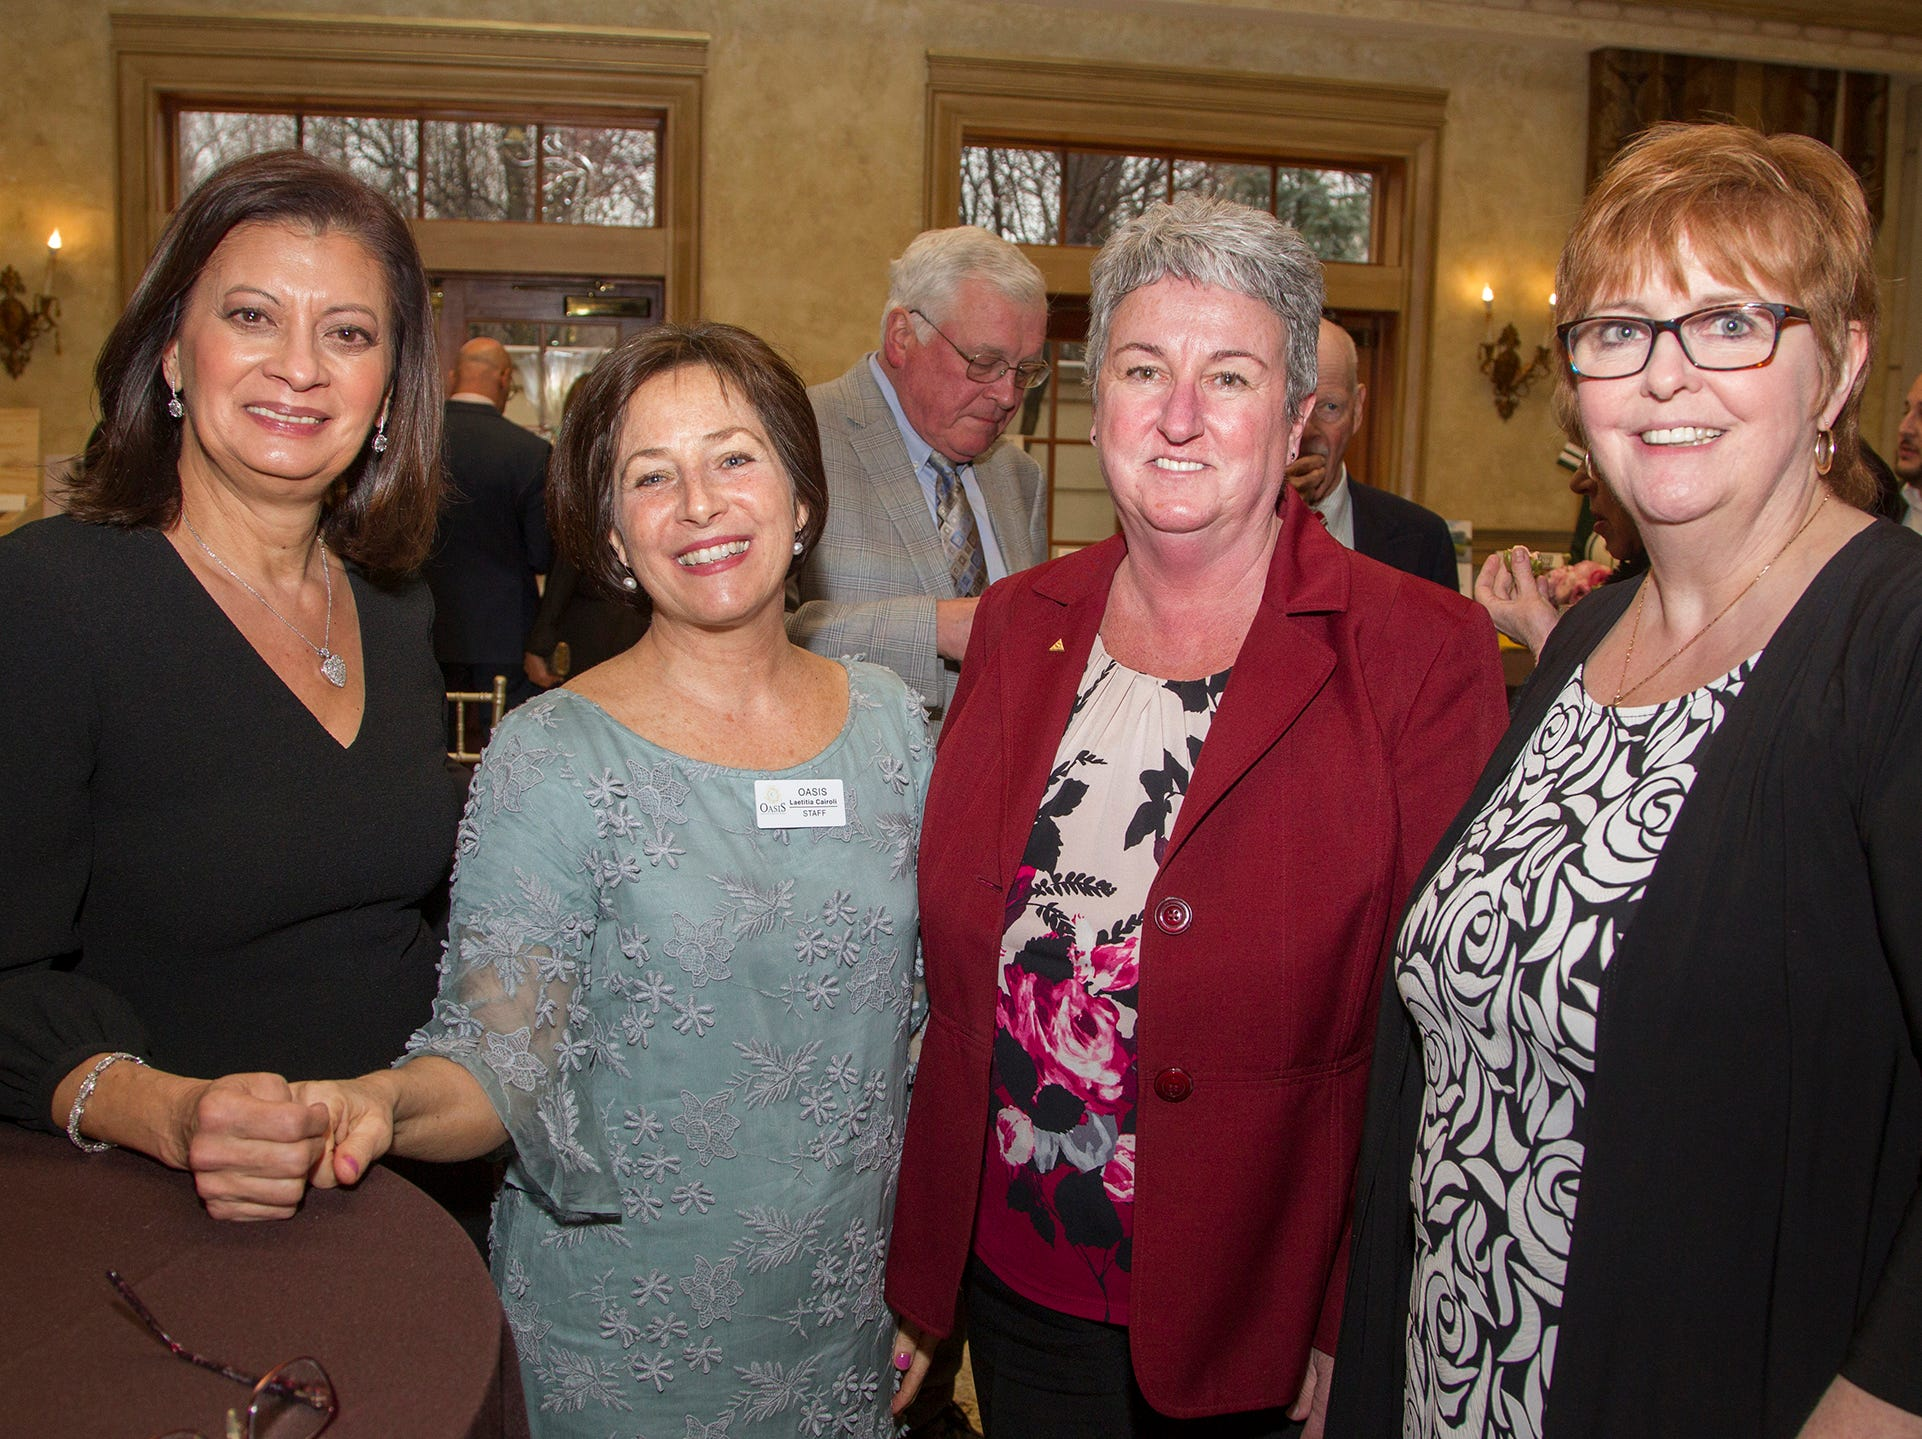 Lillian Bryan, Laetitia Cairoli, Cindy Perrotta, Judy Keyes. Oasis held its 23rd annual Gala of Hope at The Venetian in Garfield. 04/05/2019